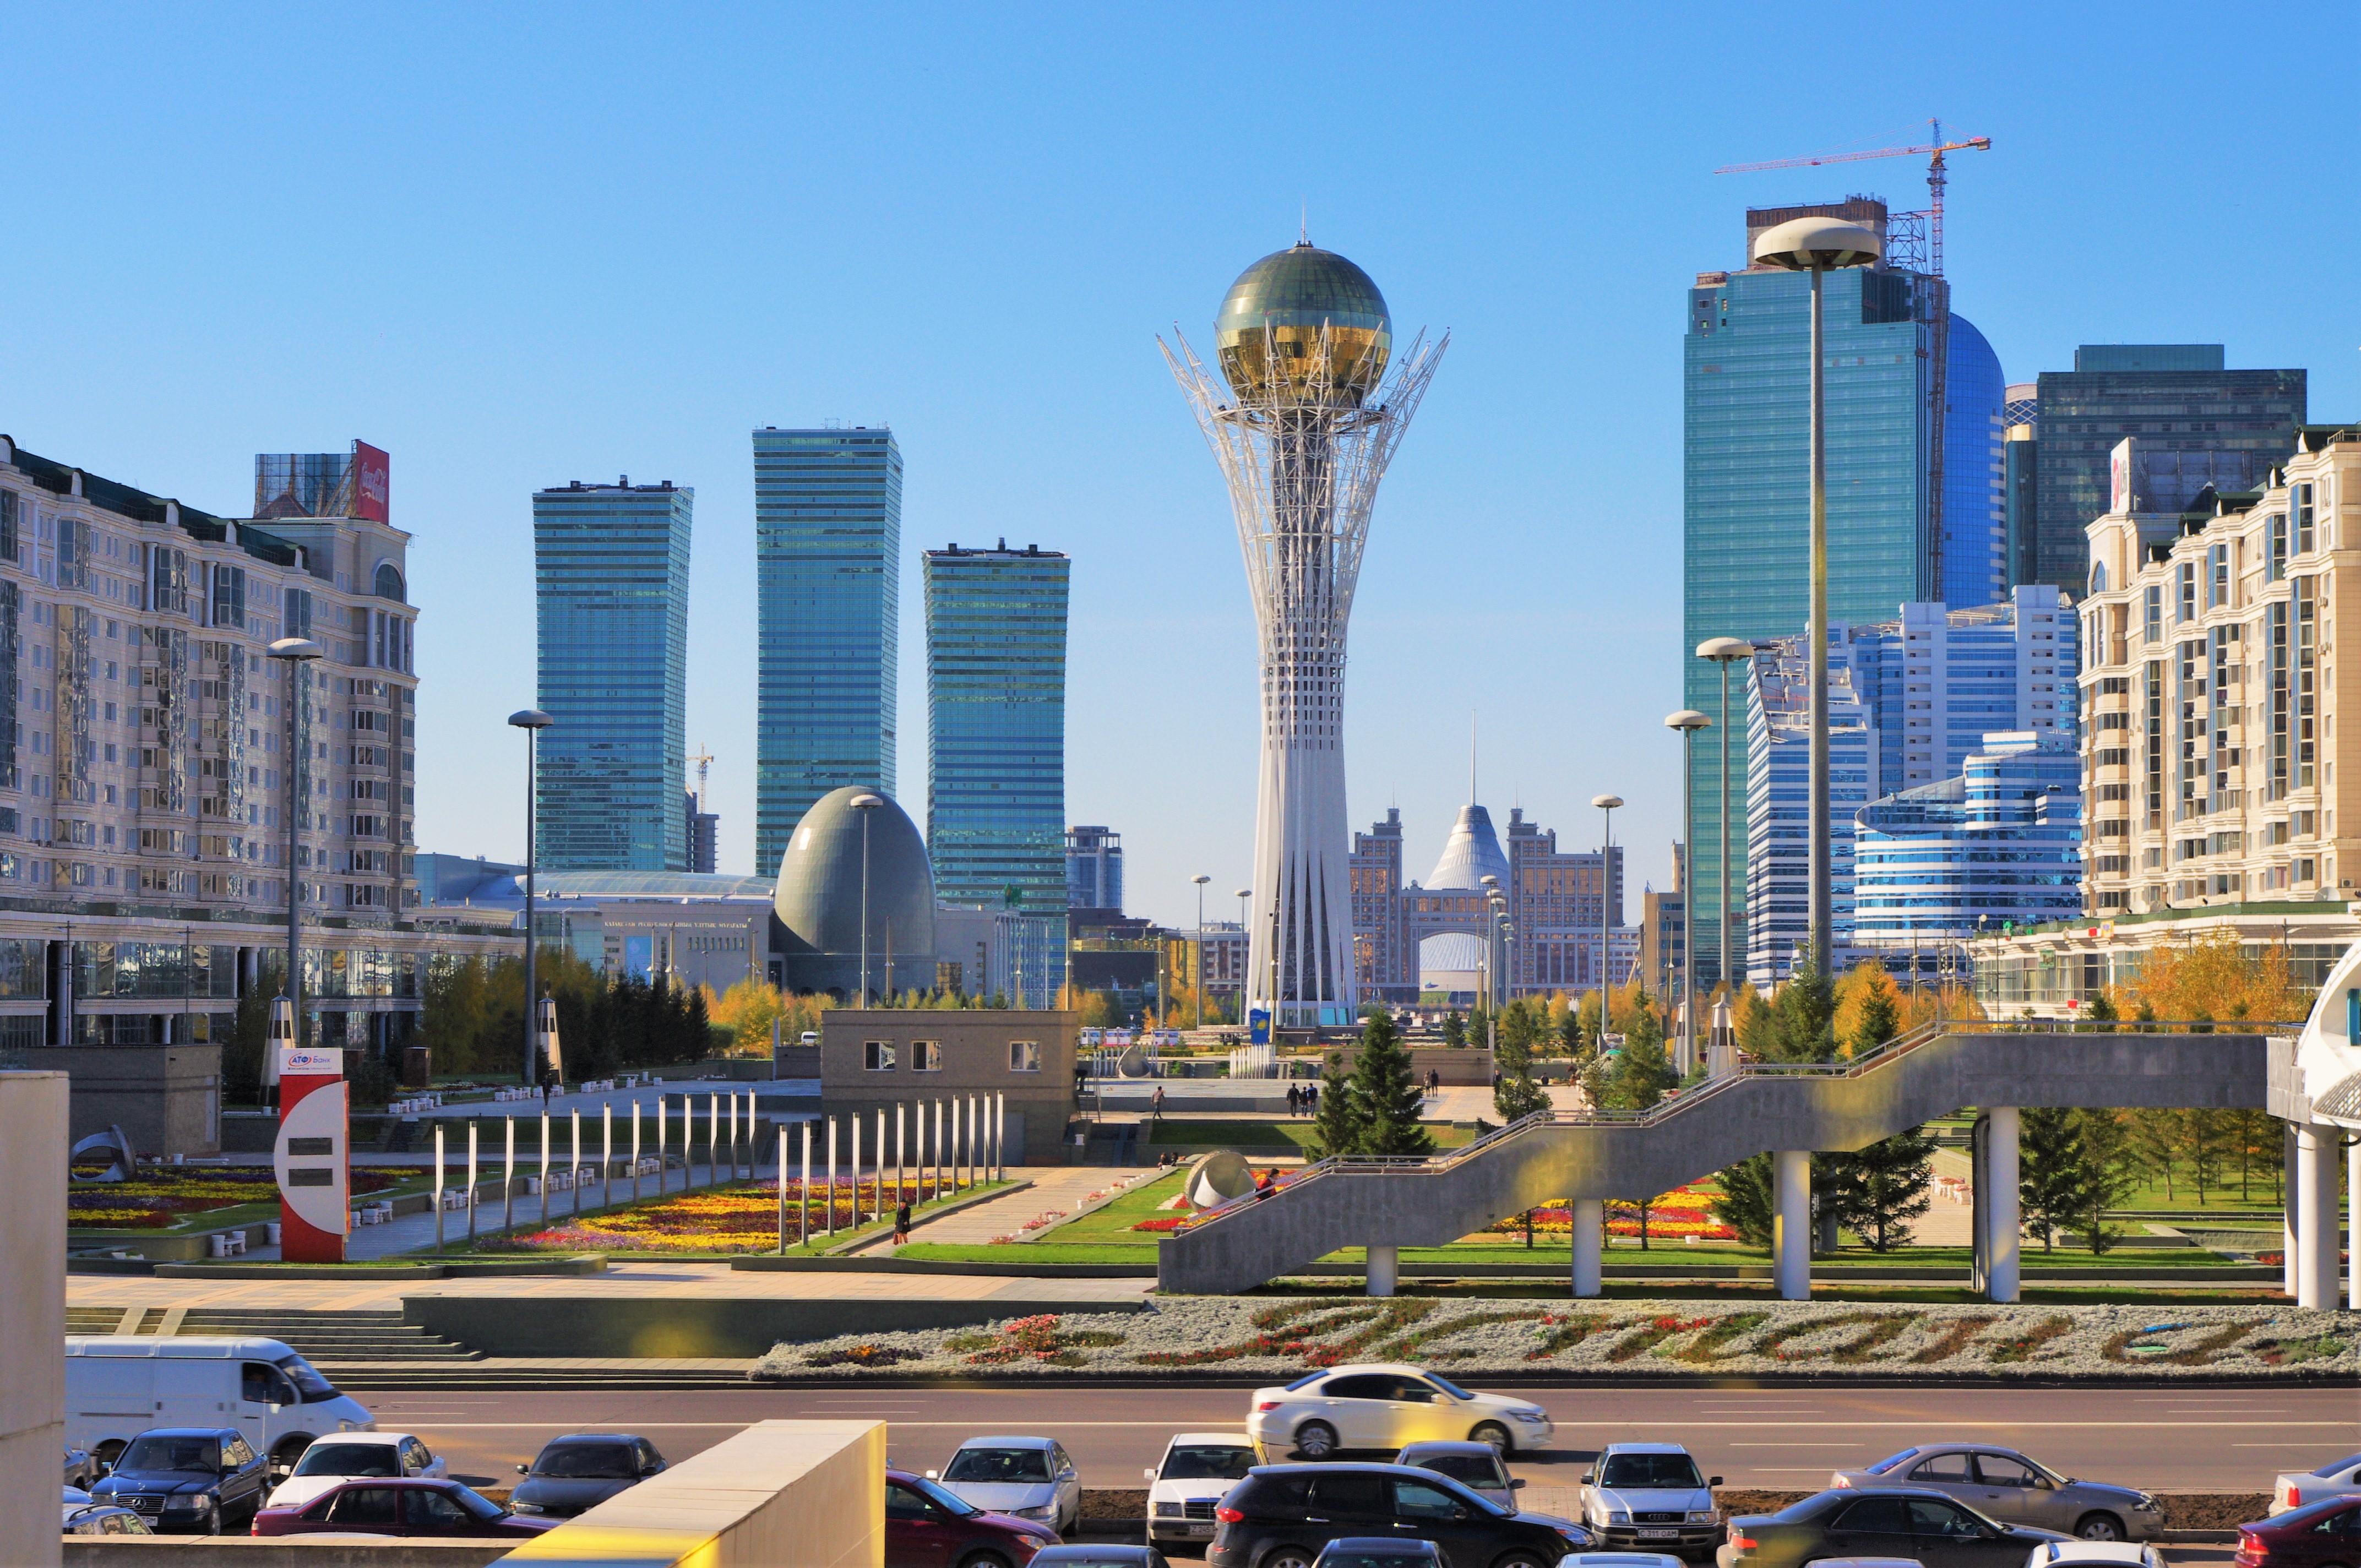 Description Central Downtown Astana 2 Jpg